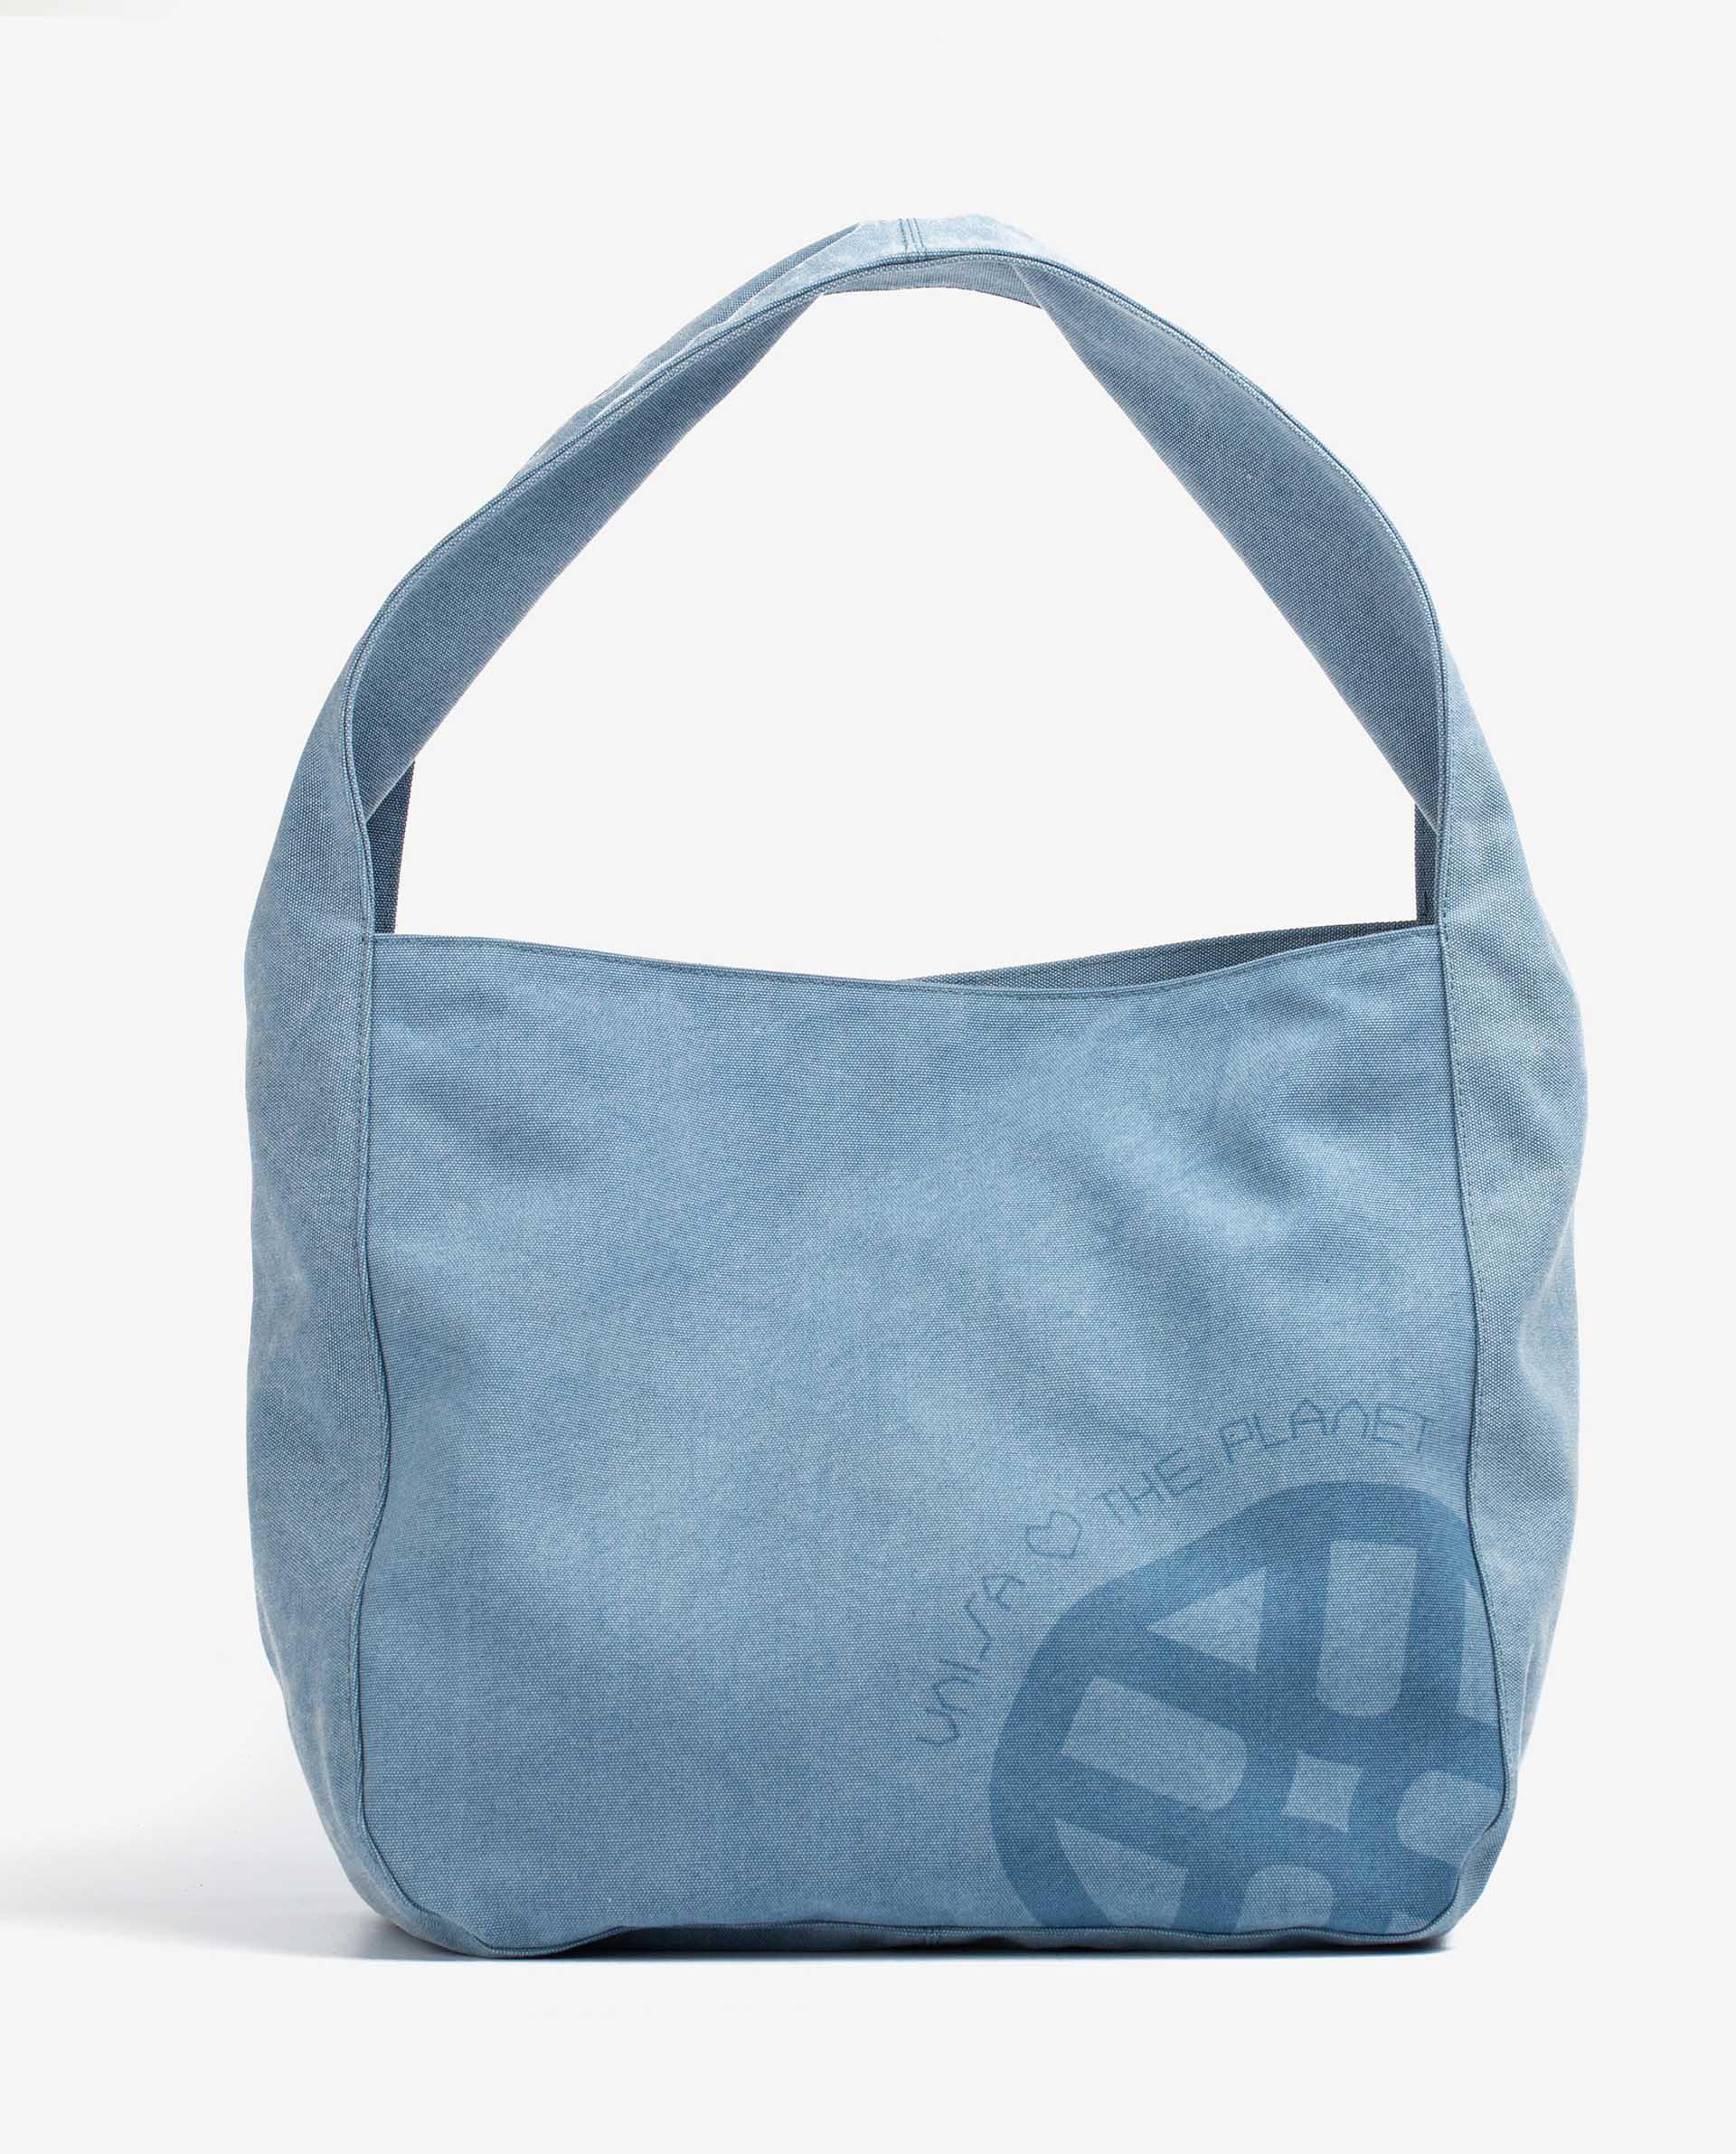 UNISA Hobo Bag aus EcoLino mit graviertem Monogramm ZMINTAECO_ECL 5